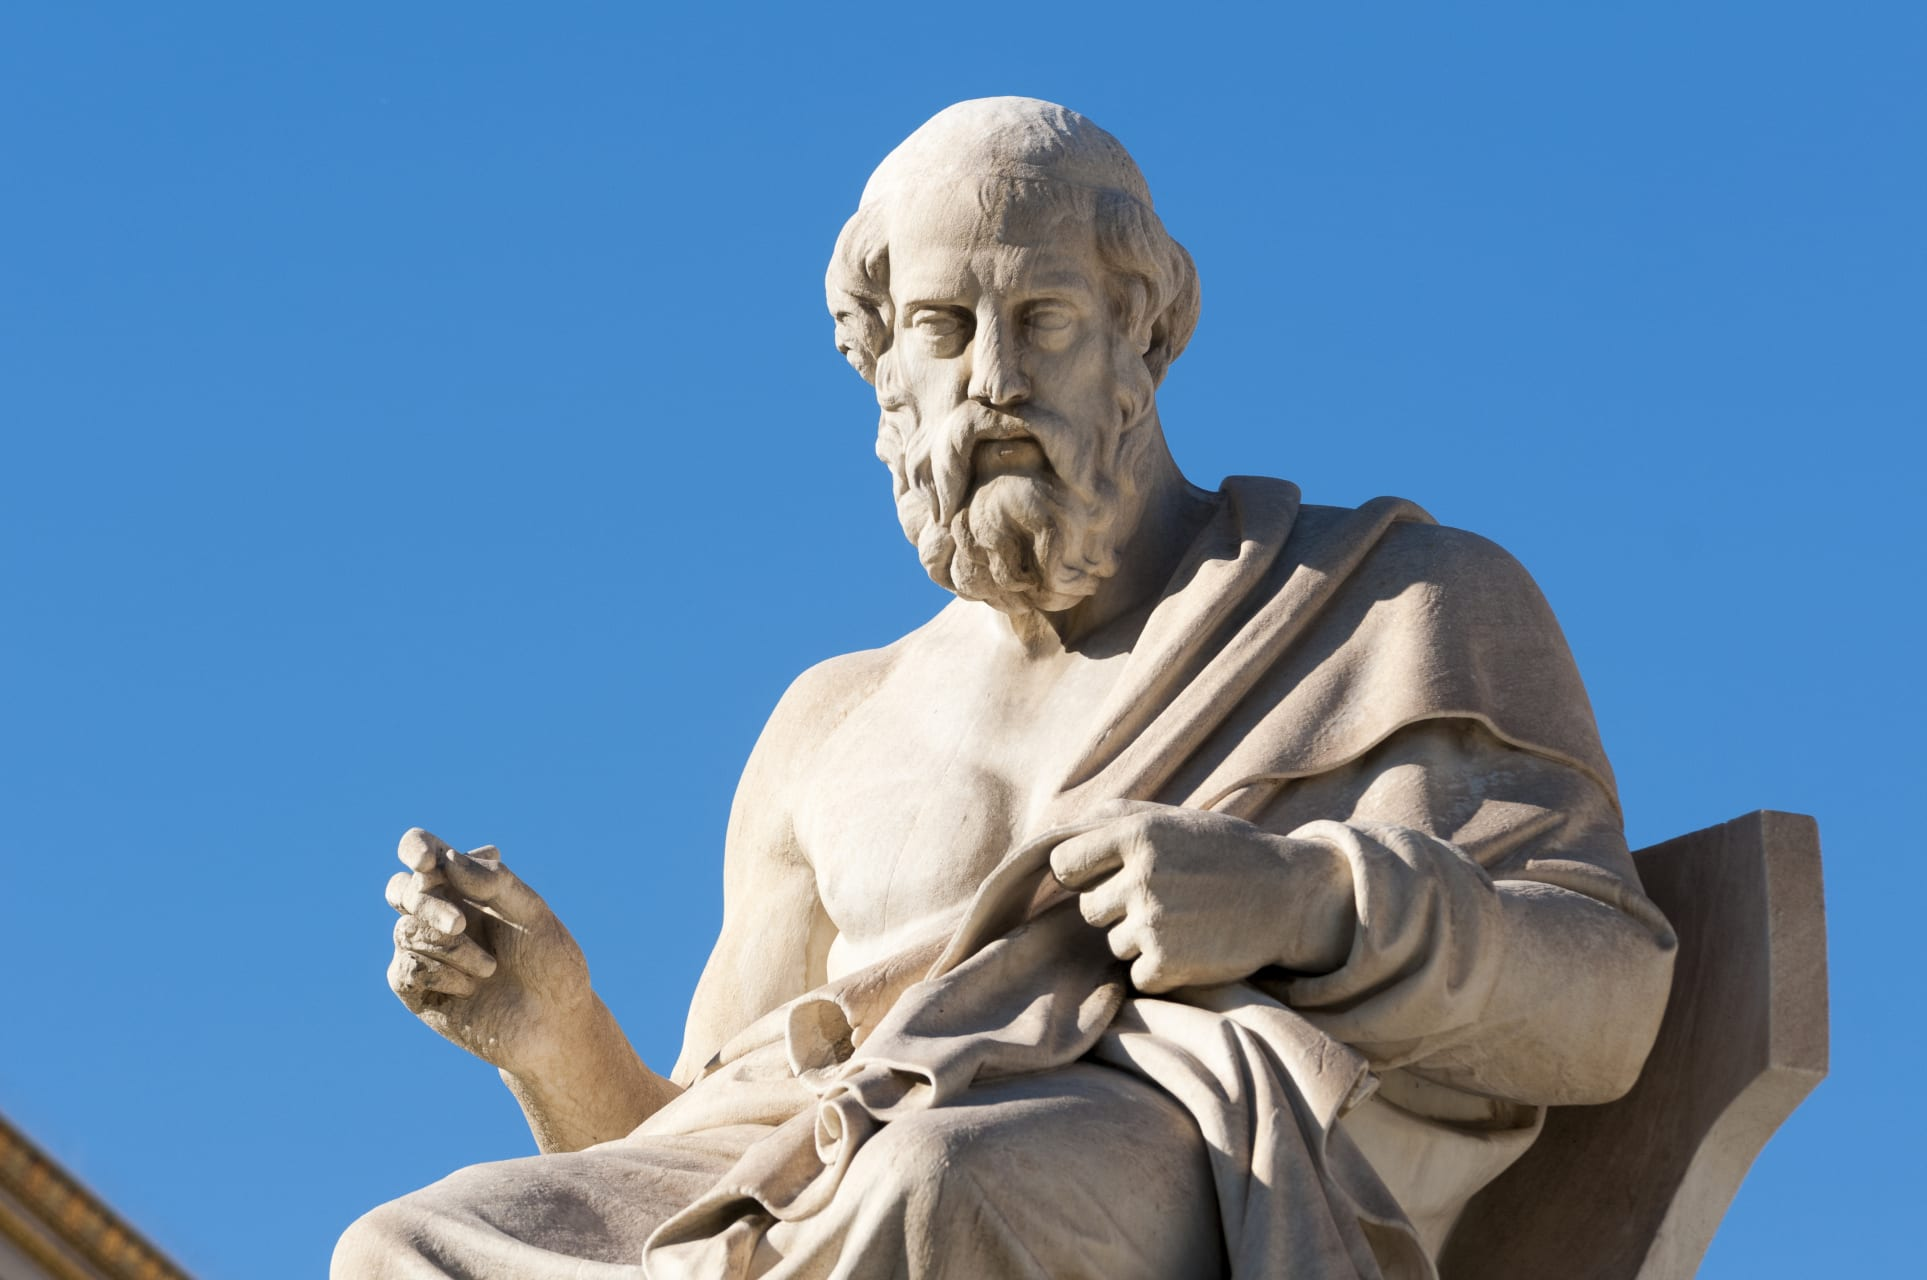 Manhattan Kansas - Plato's Republic 1: What is Justice?